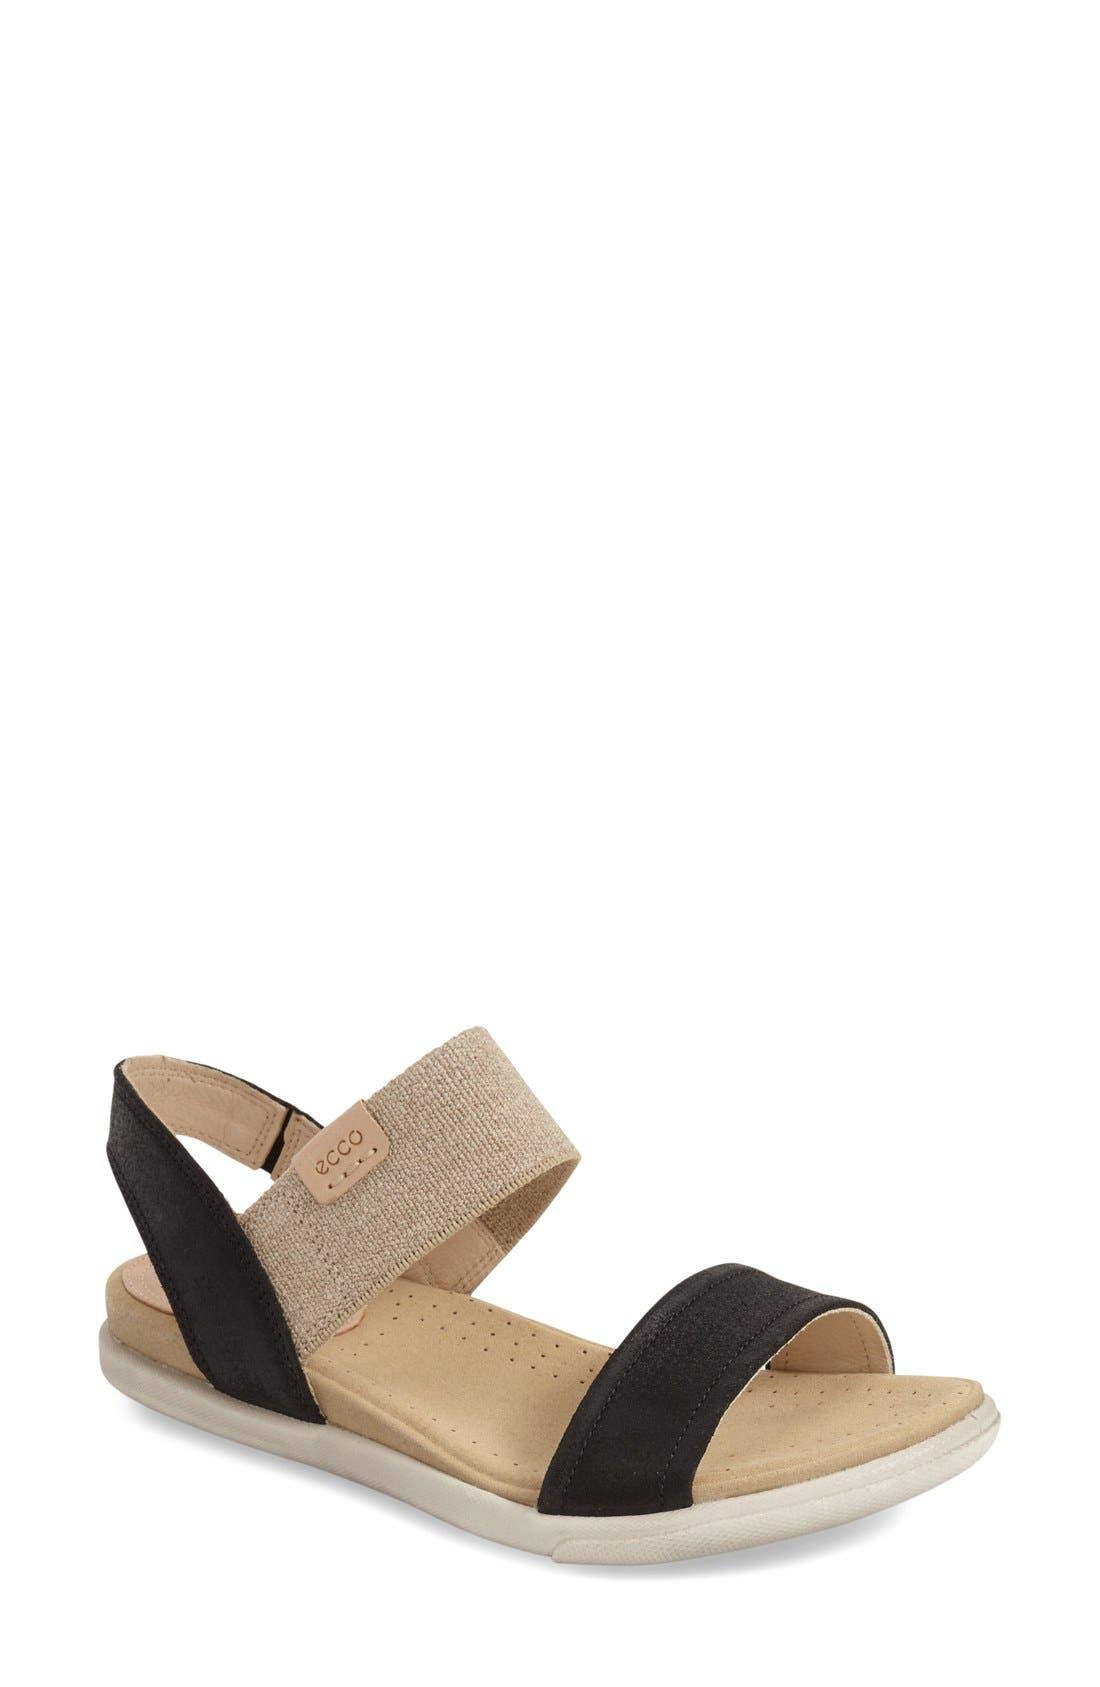 Main Image - ECCO 'Damara' Sandal (Women)